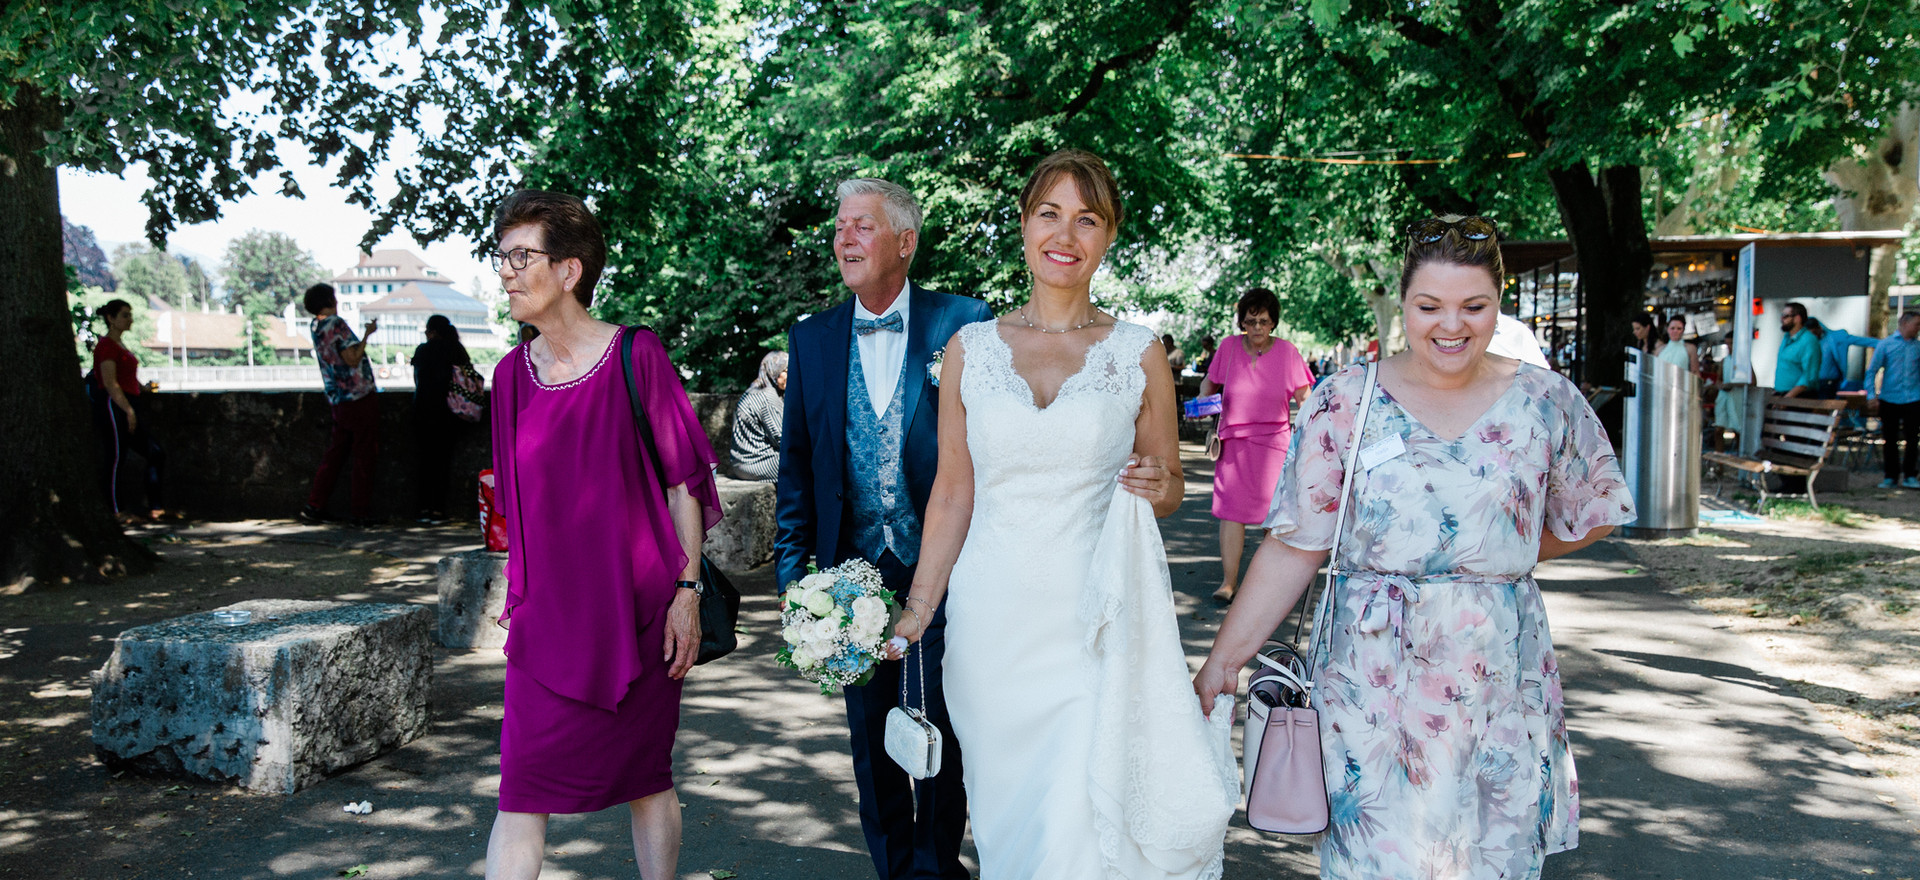 Hochzeit_Doris-Marcel_U92B5855_326.jpg